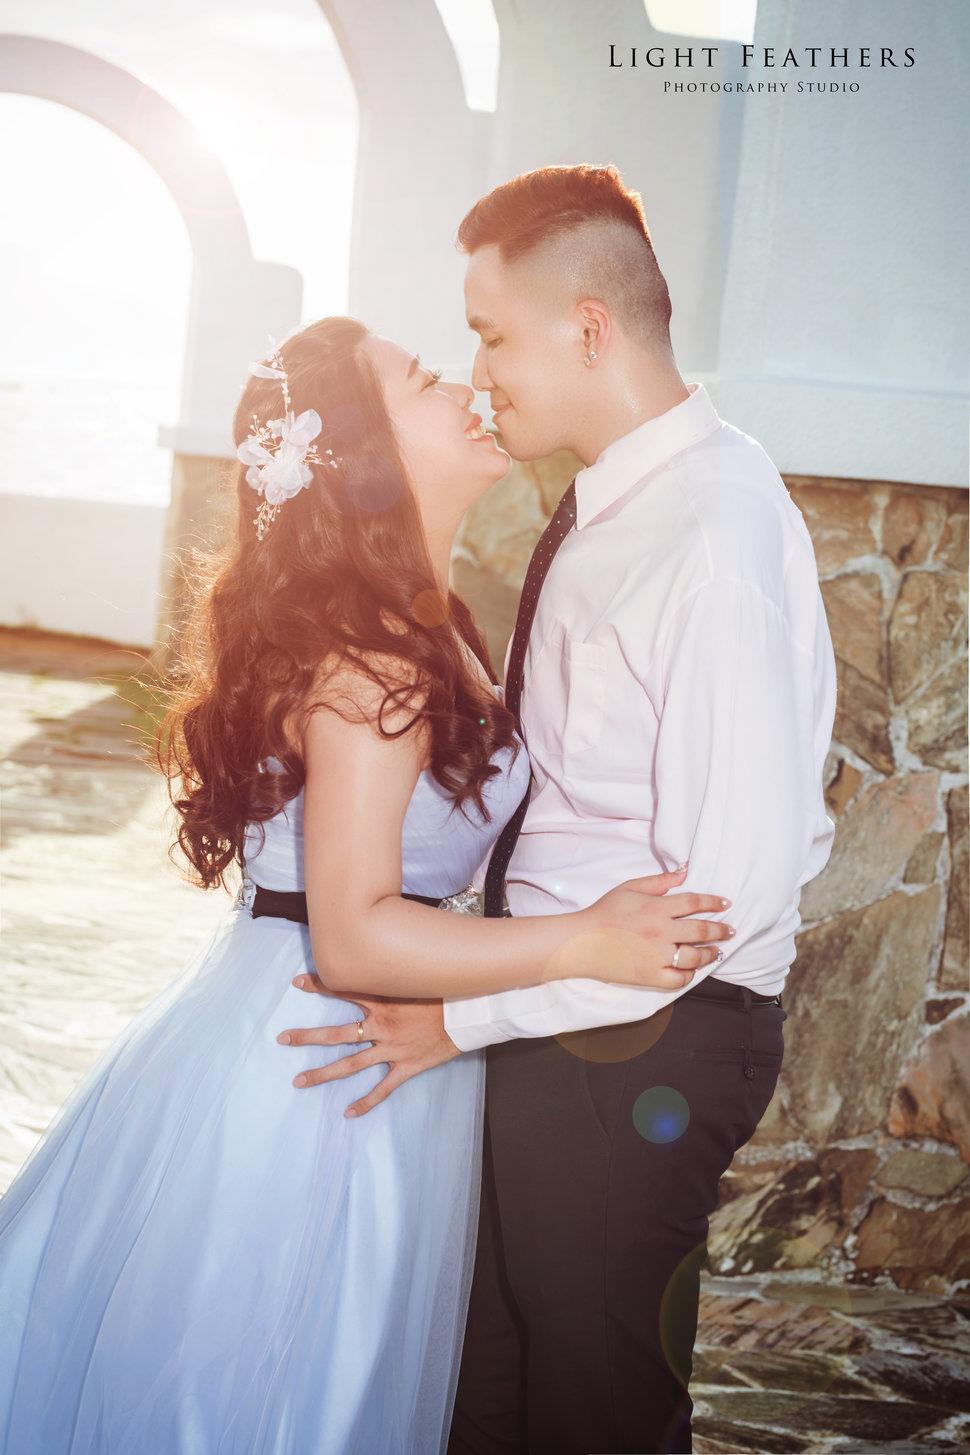 5D4_0281 - Promaker婚禮紀錄攝影團隊婚攝豪哥《結婚吧》